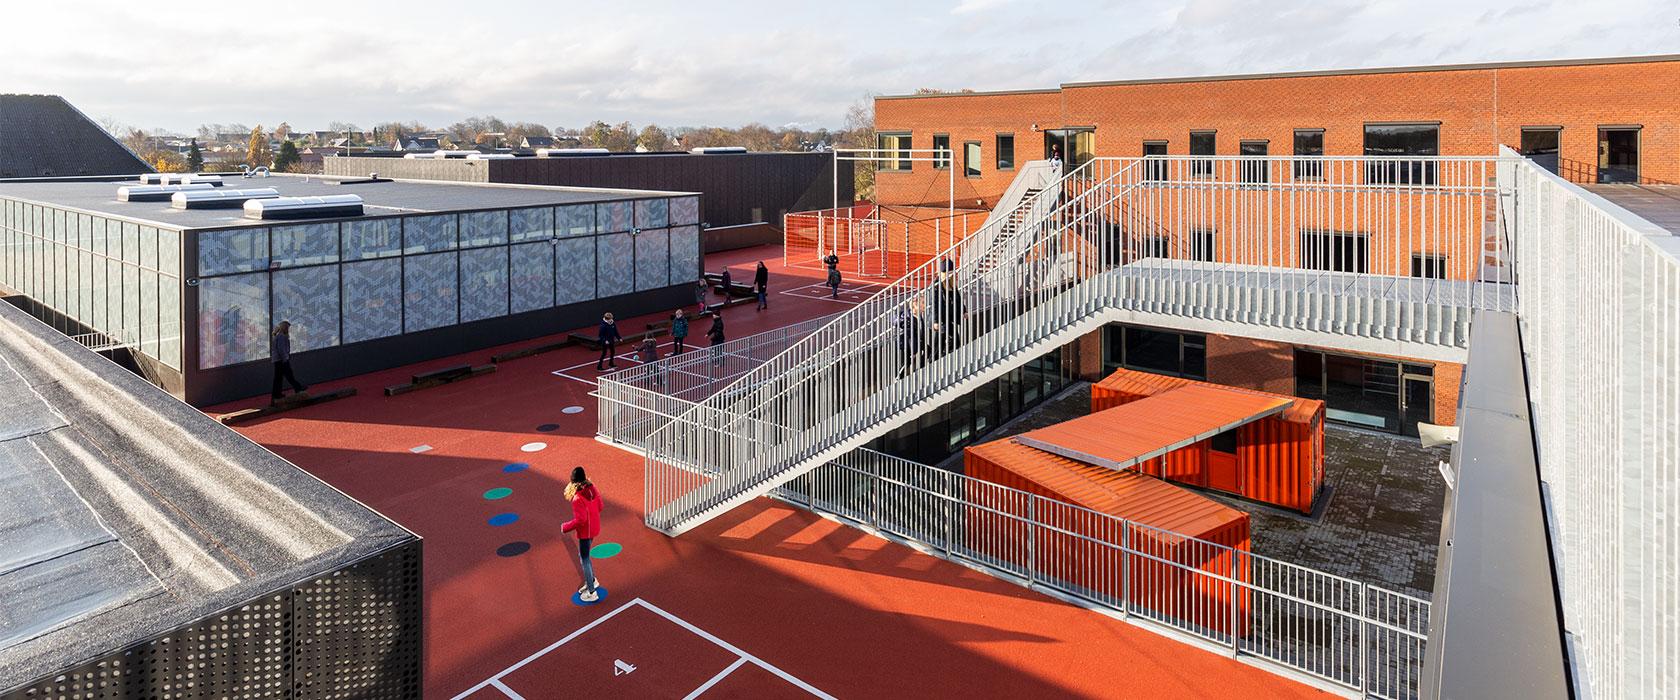 Lindbjergskolens tagareal